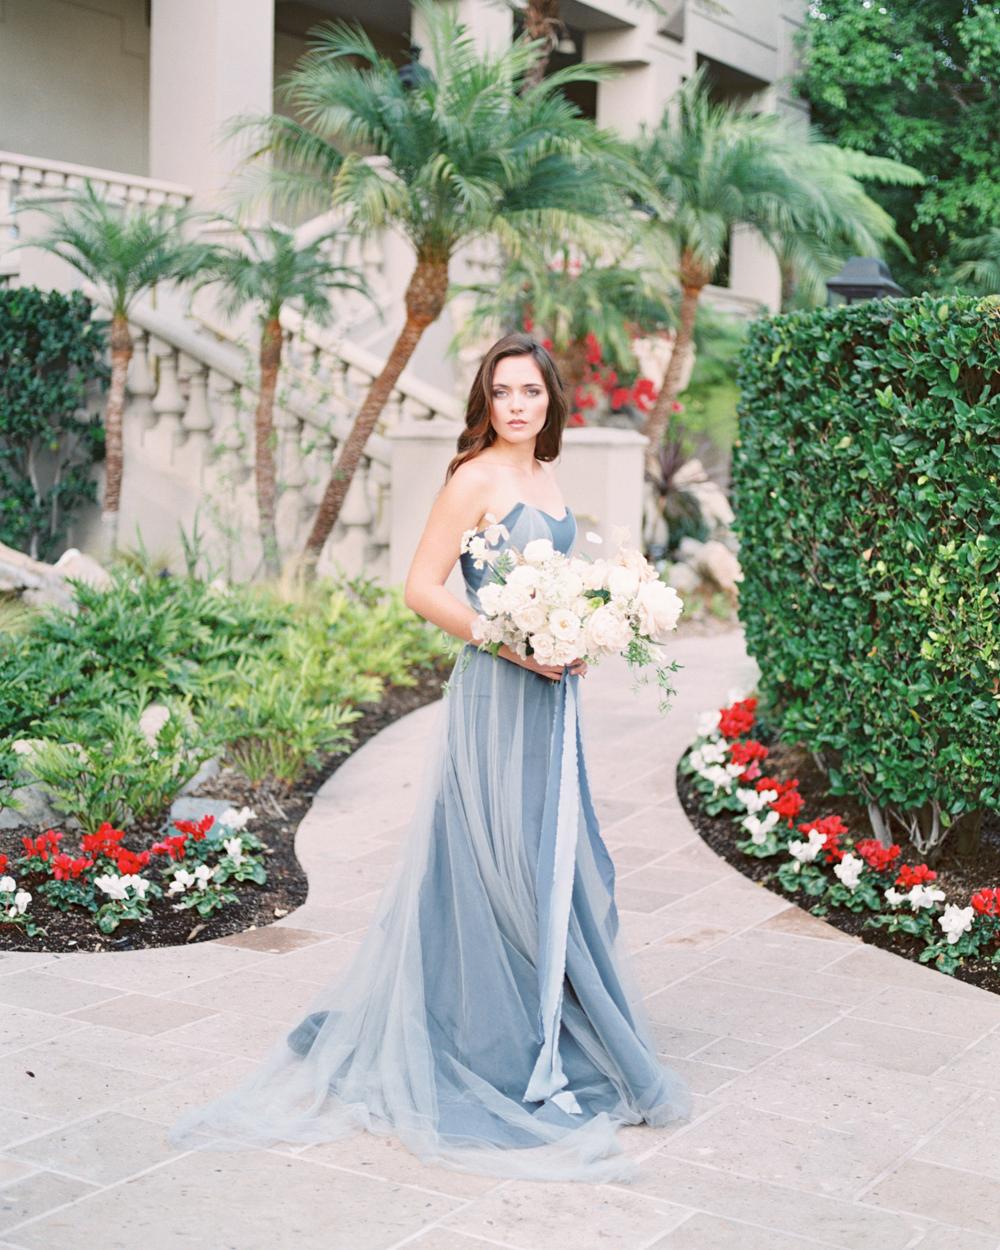 AKP_Los_Angeles_Film_Wedding_Photographer_Ritz_Carlton_Marina_del_Rey-13.jpg